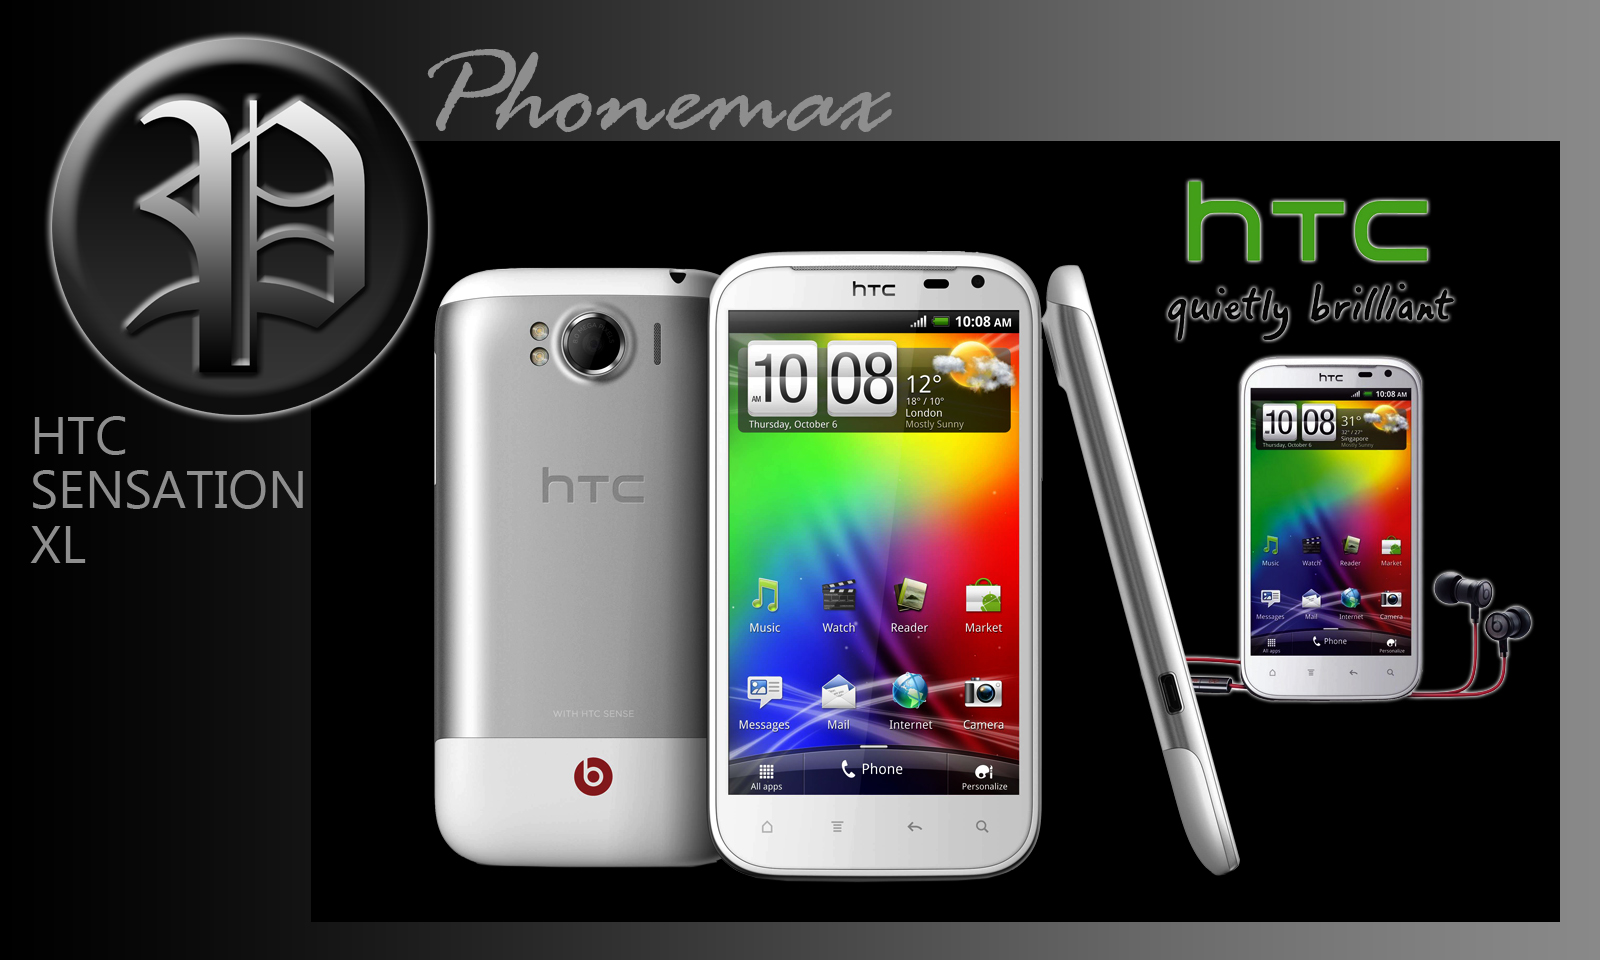 phonemax mobile and accessories htc sensation xl original rm1499. Black Bedroom Furniture Sets. Home Design Ideas